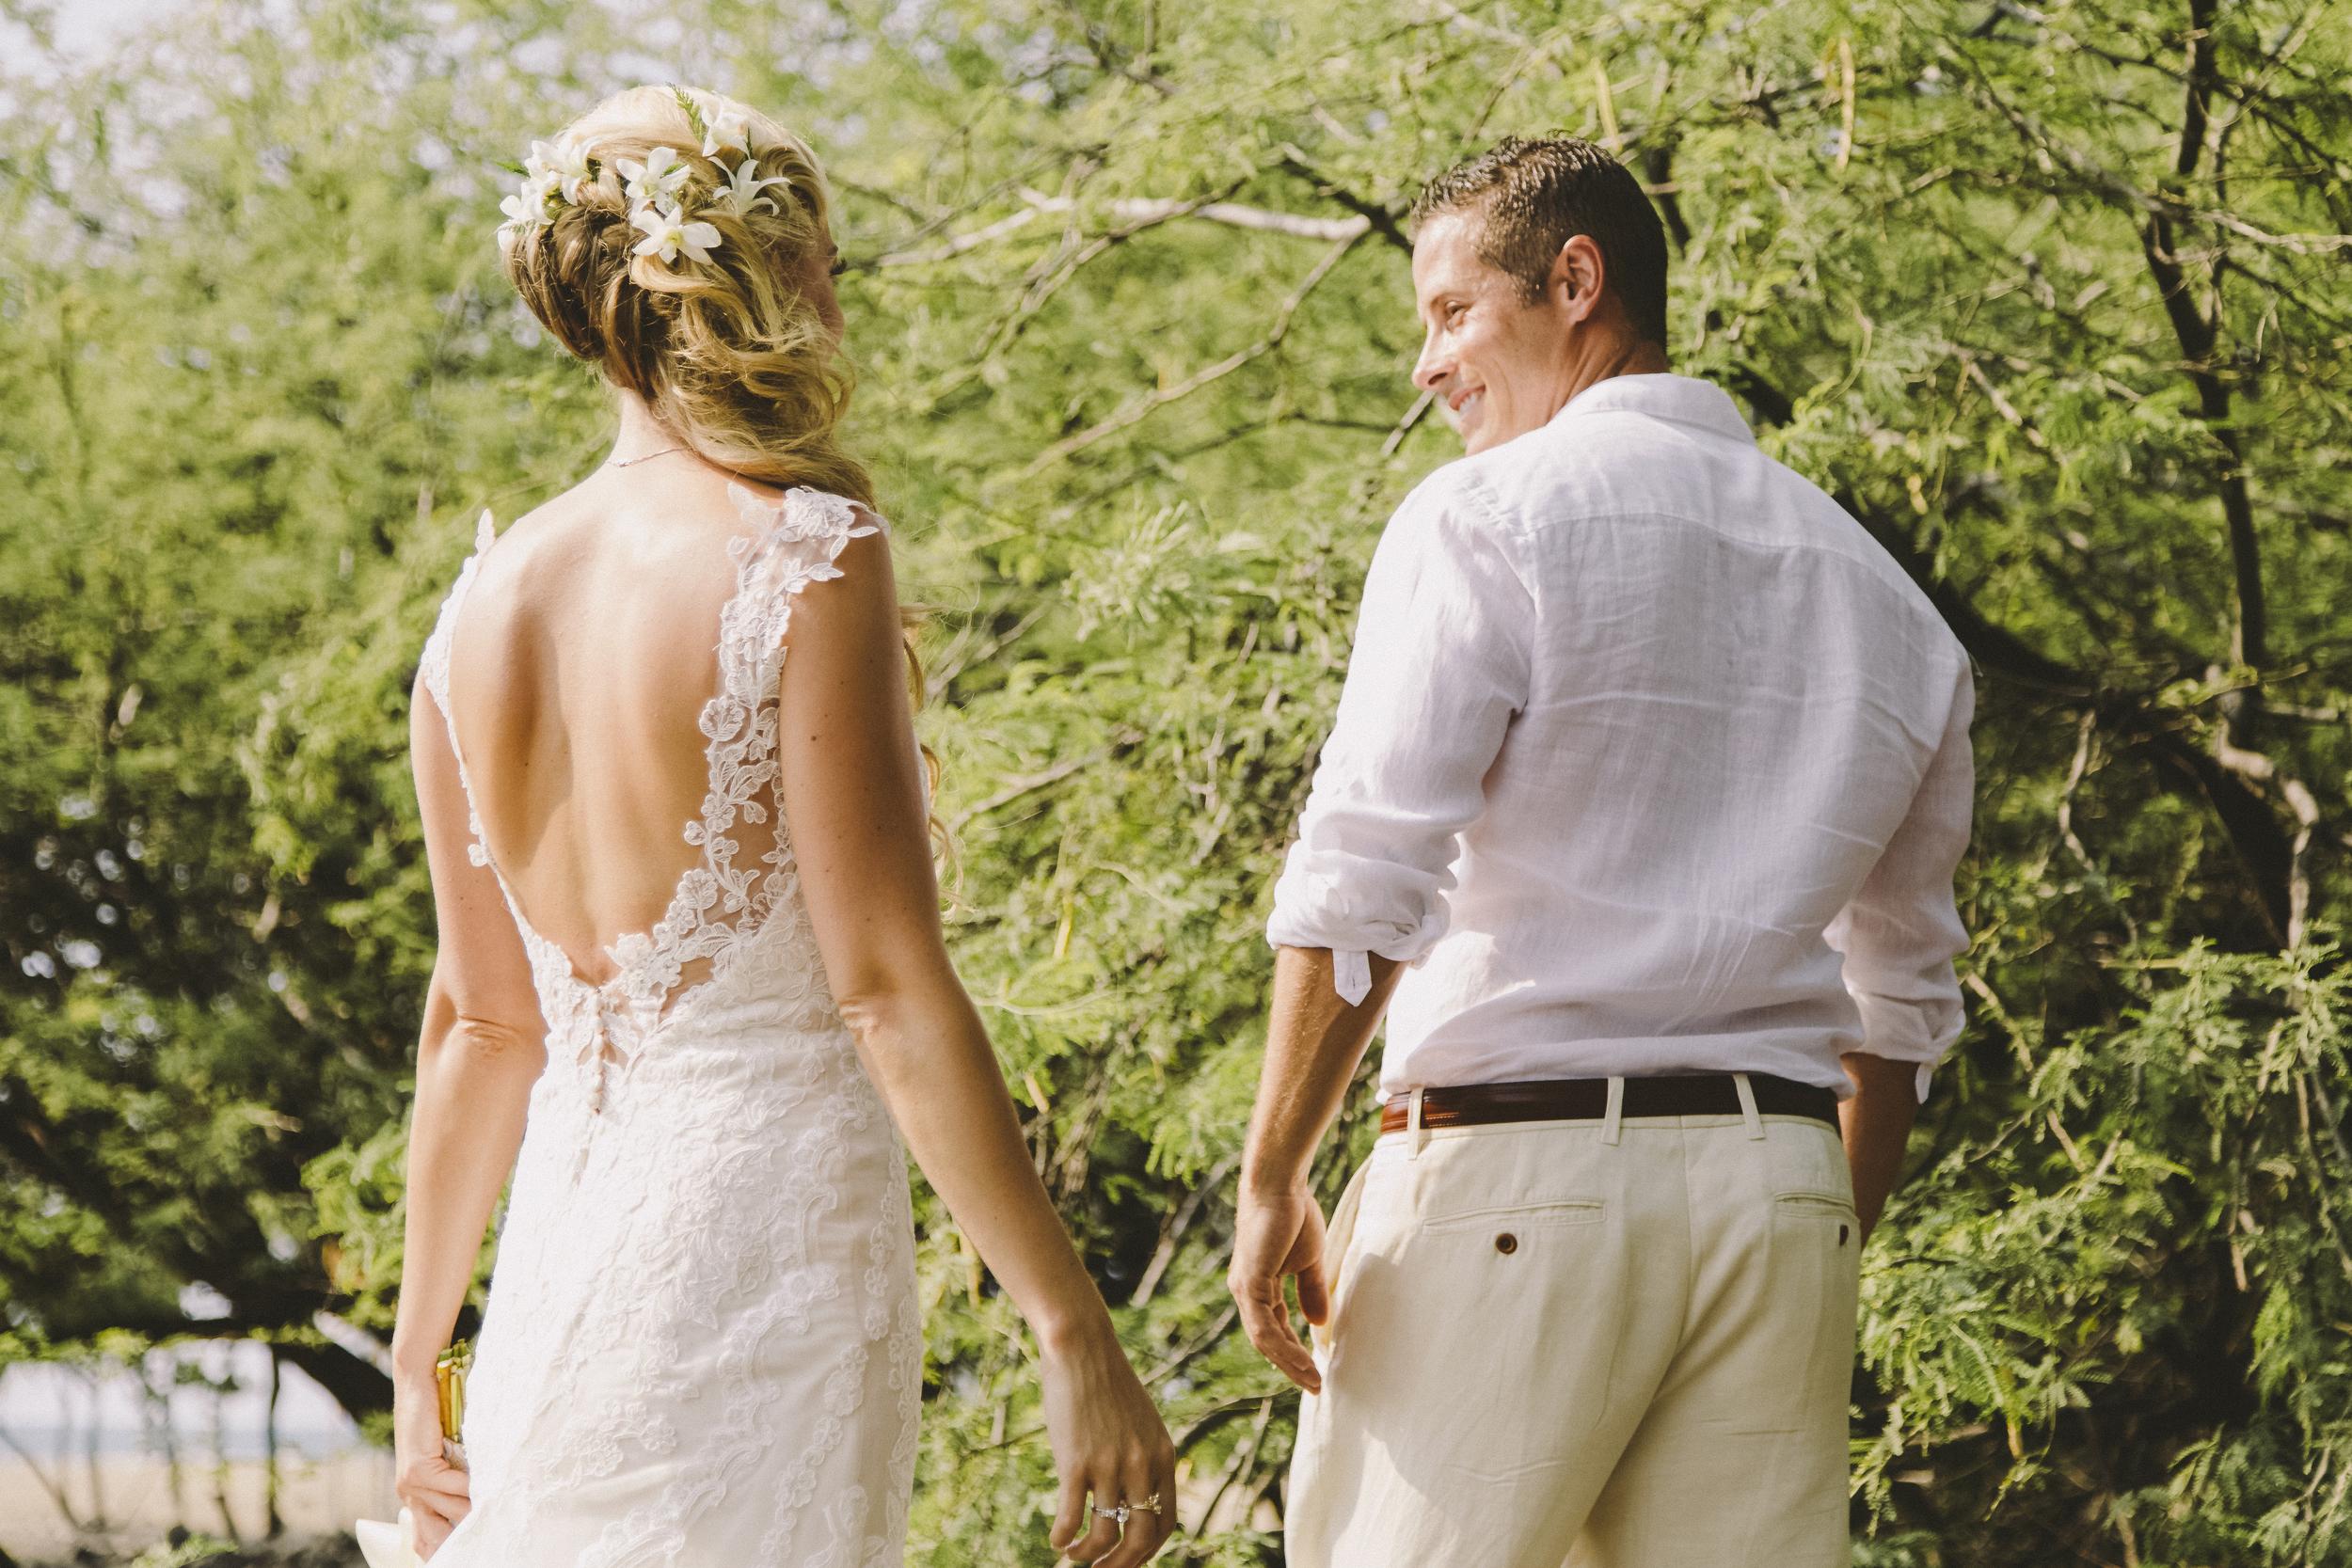 angie-diaz-photography-hawaii-wedding-photographer-kelli-jay-29.jpg